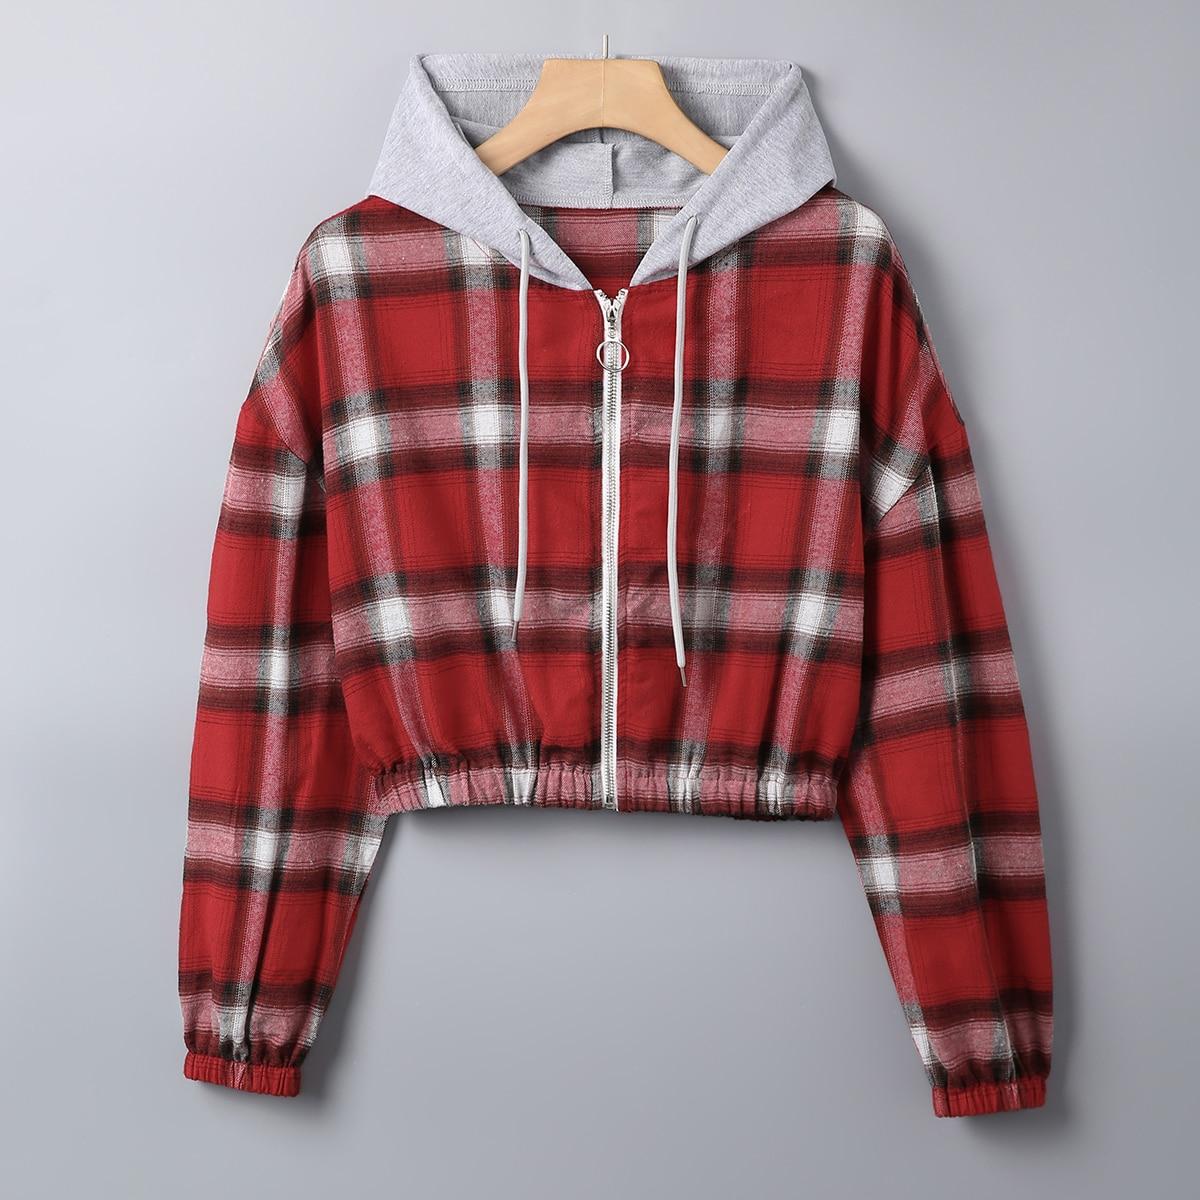 Plus Plaid Zip Up Drawstring Hooded Jacket